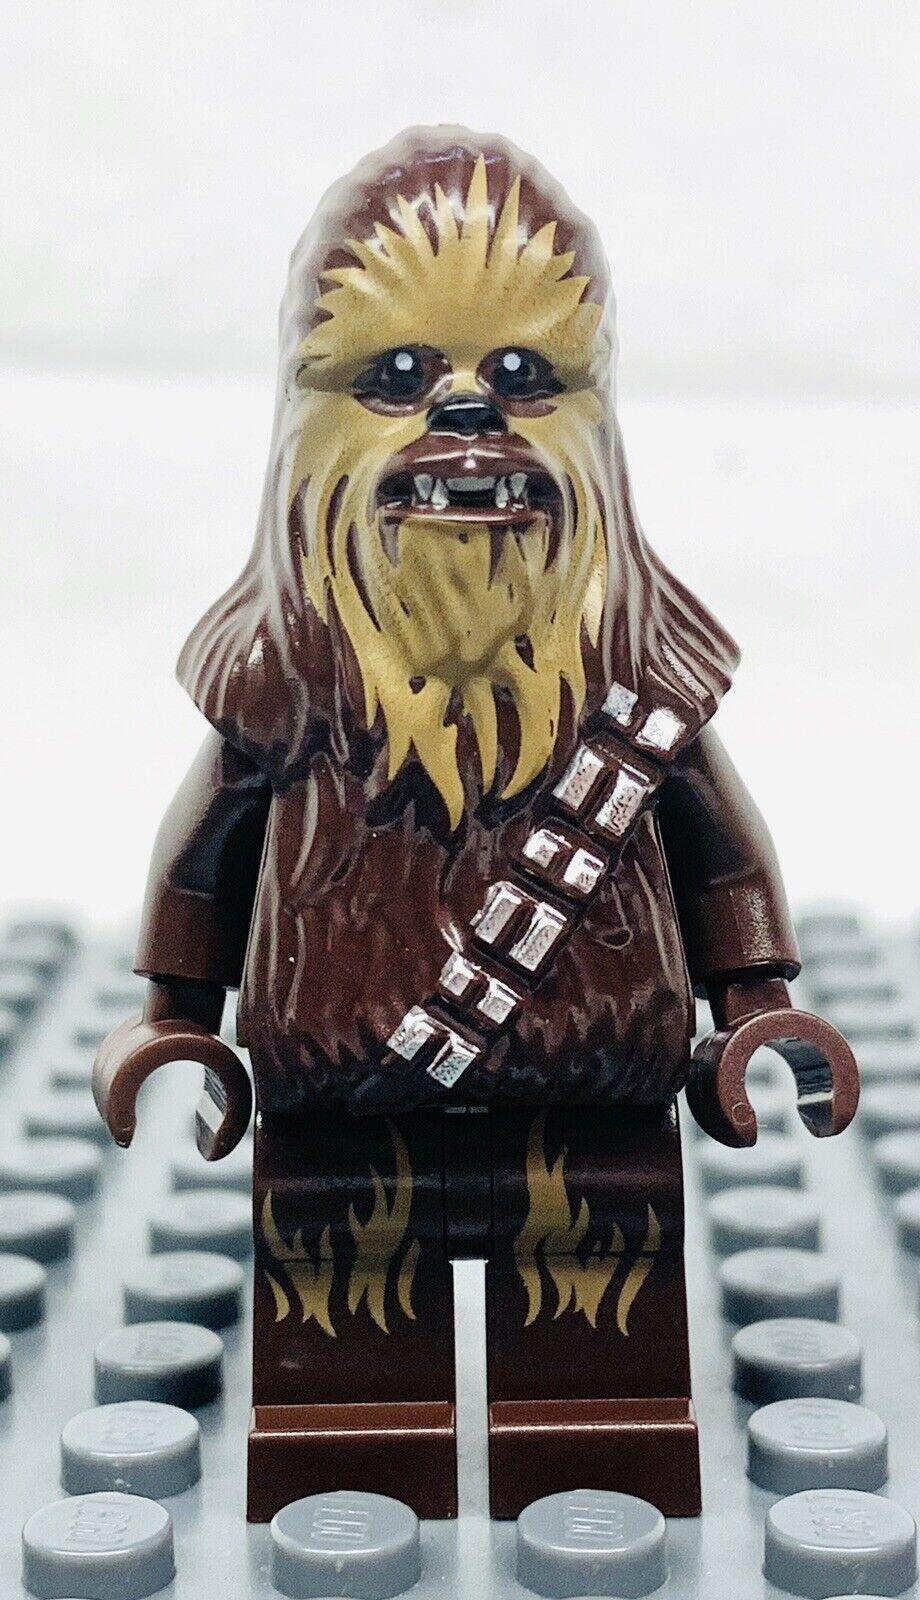 Chewbacca w// dark brown fur /& dark tan face new LEGO System Star Wars Minifig